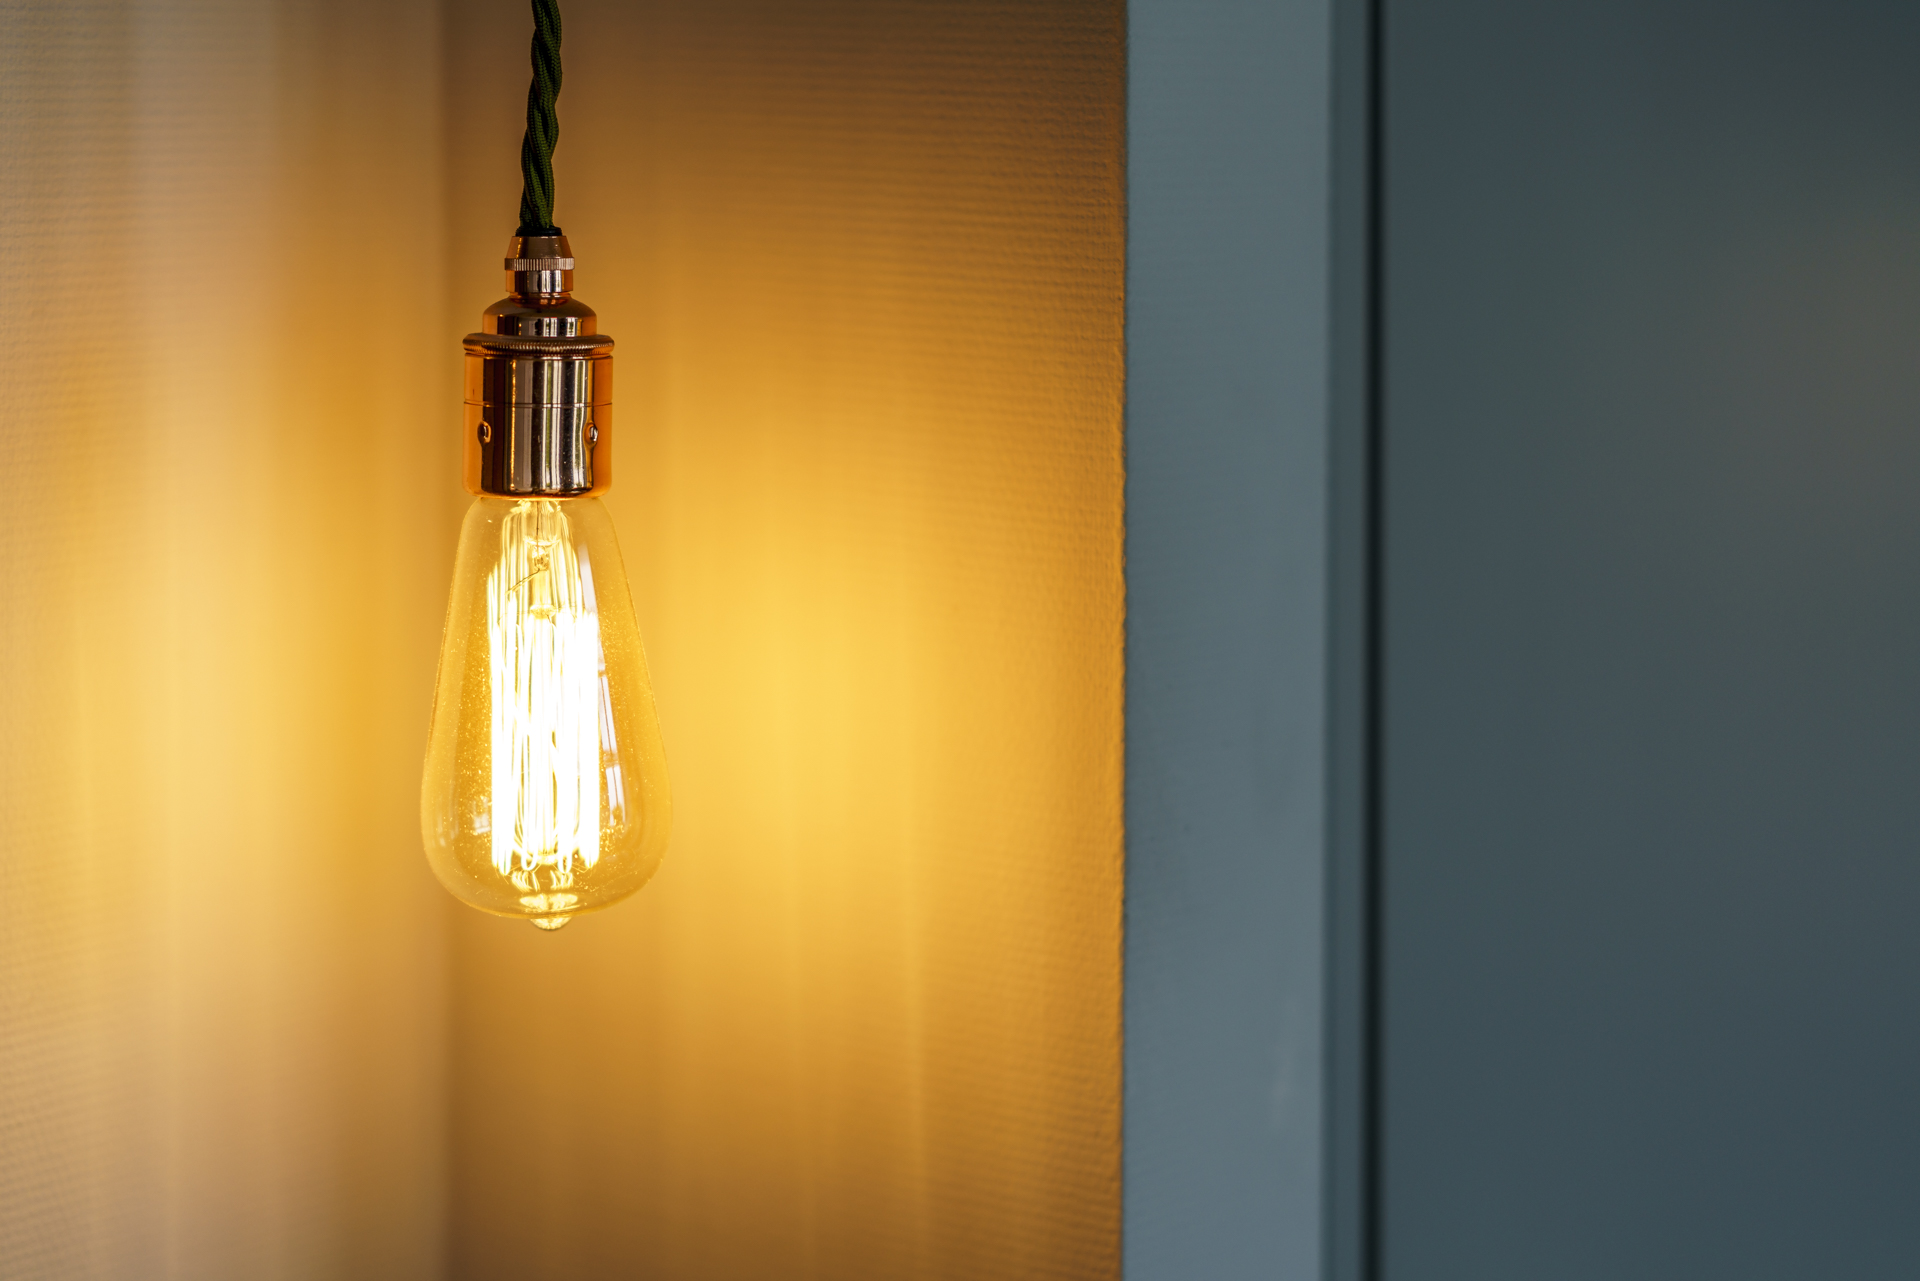 Hotel-Bellevue-Adelboden-Lampe